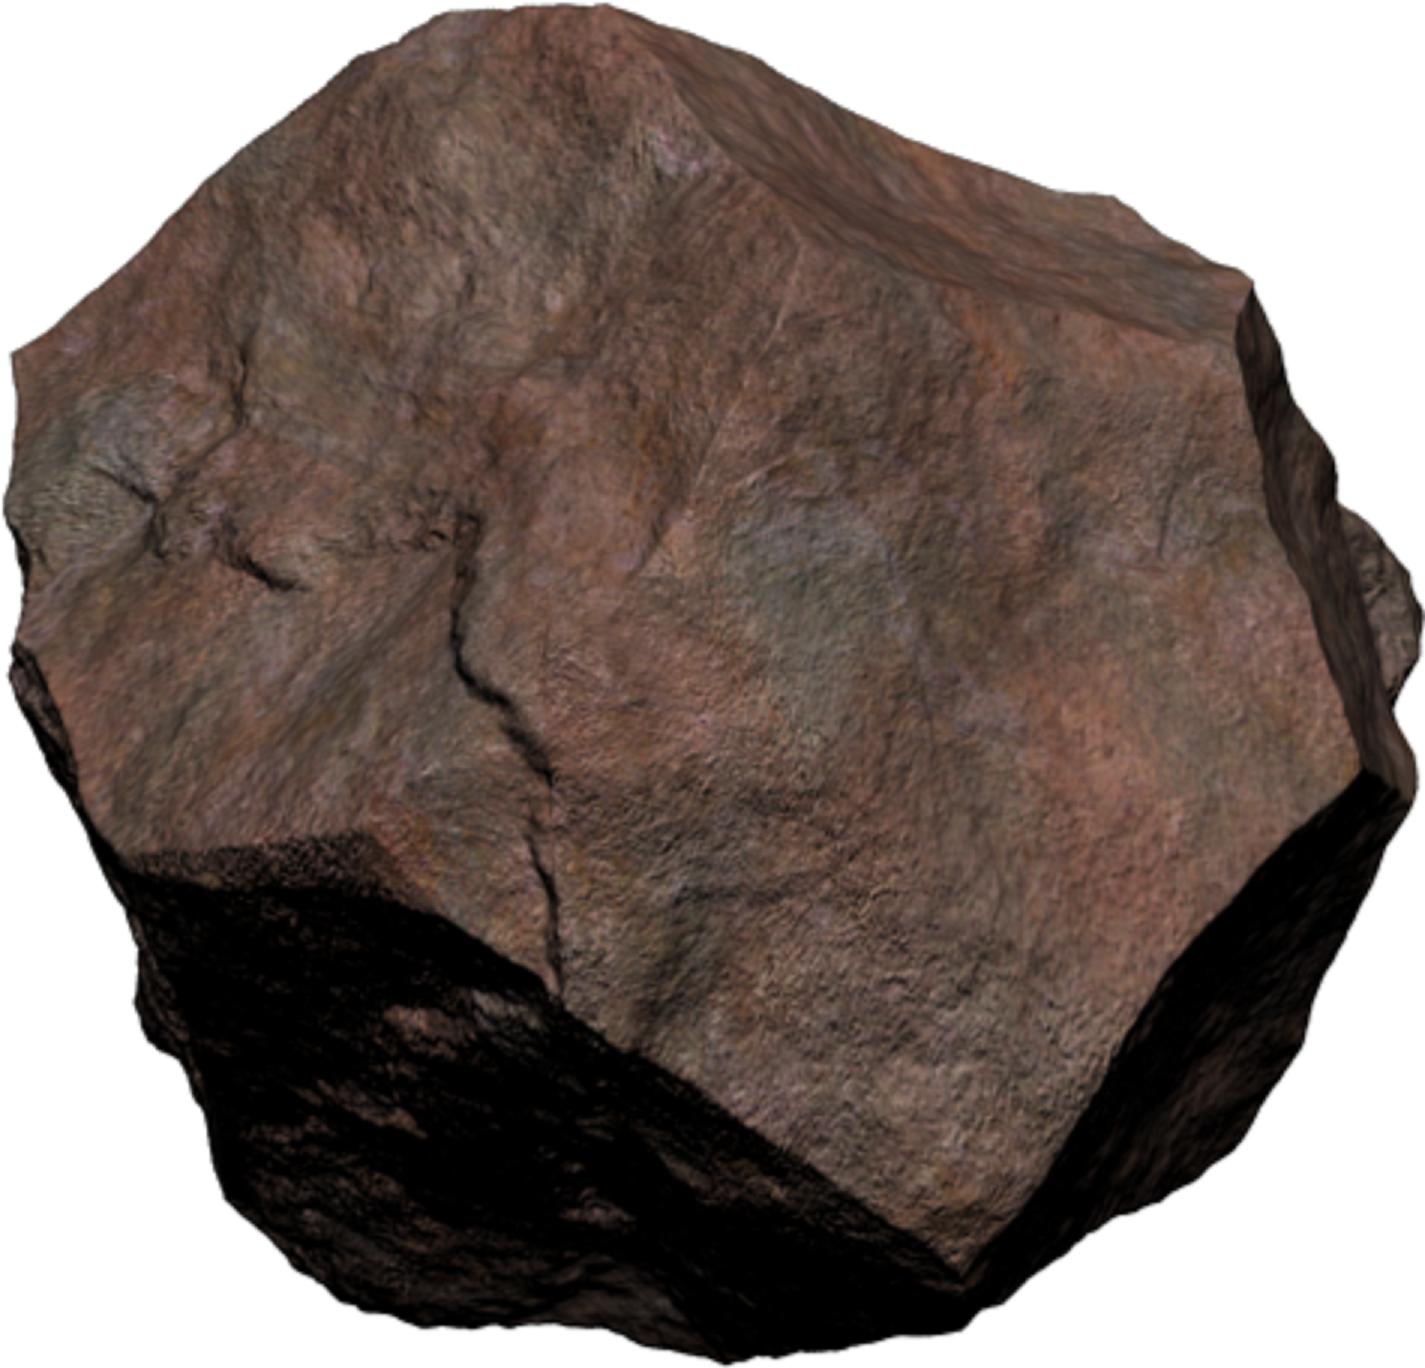 Rock L Free Images At Clker Com Vector Clip Art Online Royalty